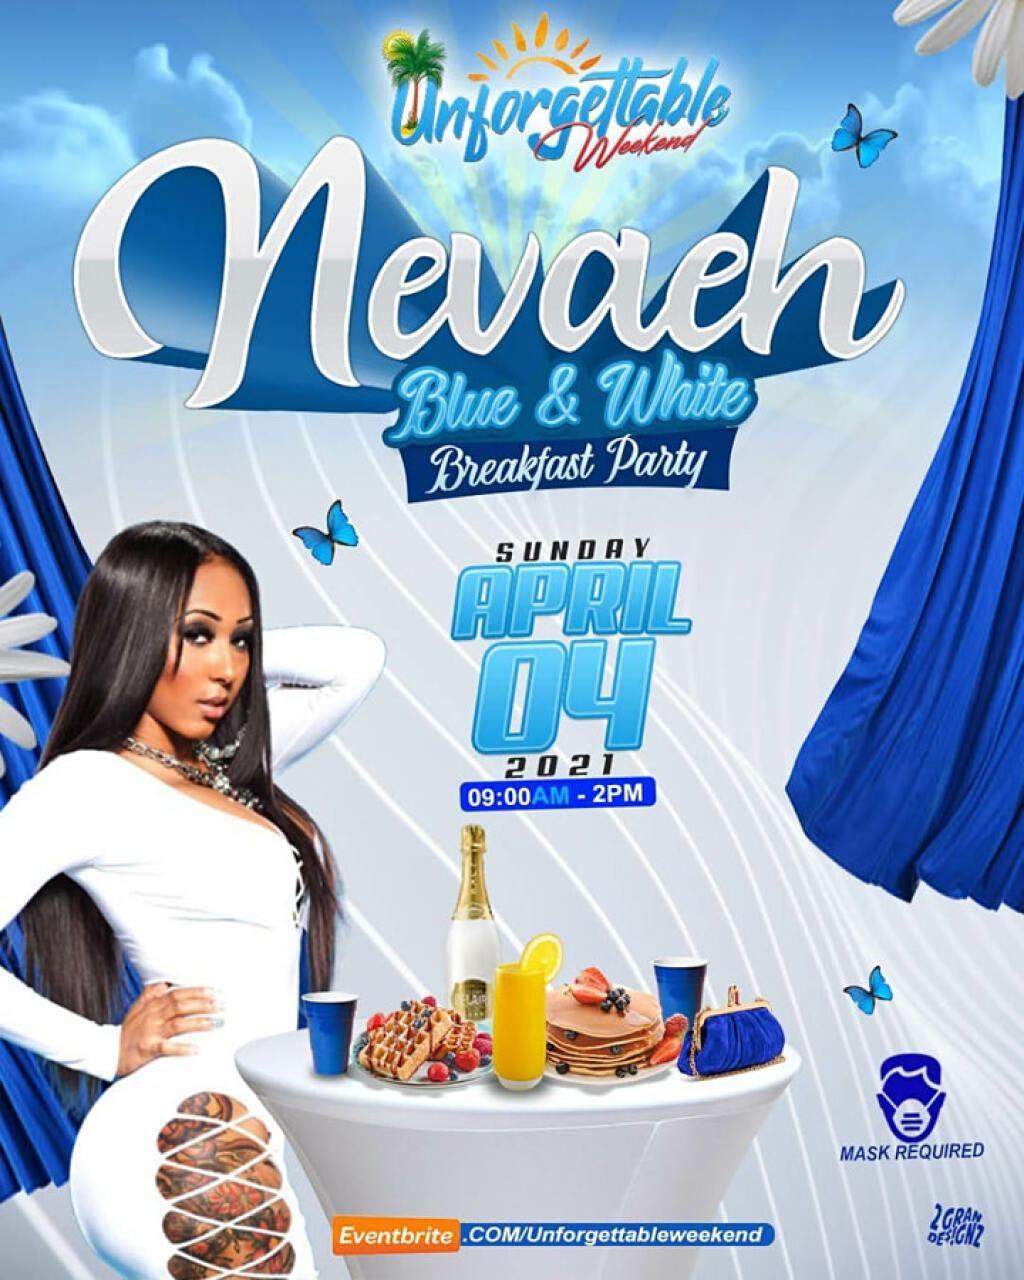 Unforgettable Weekend - Nevaeh Breakfast Party flyer or graphic.